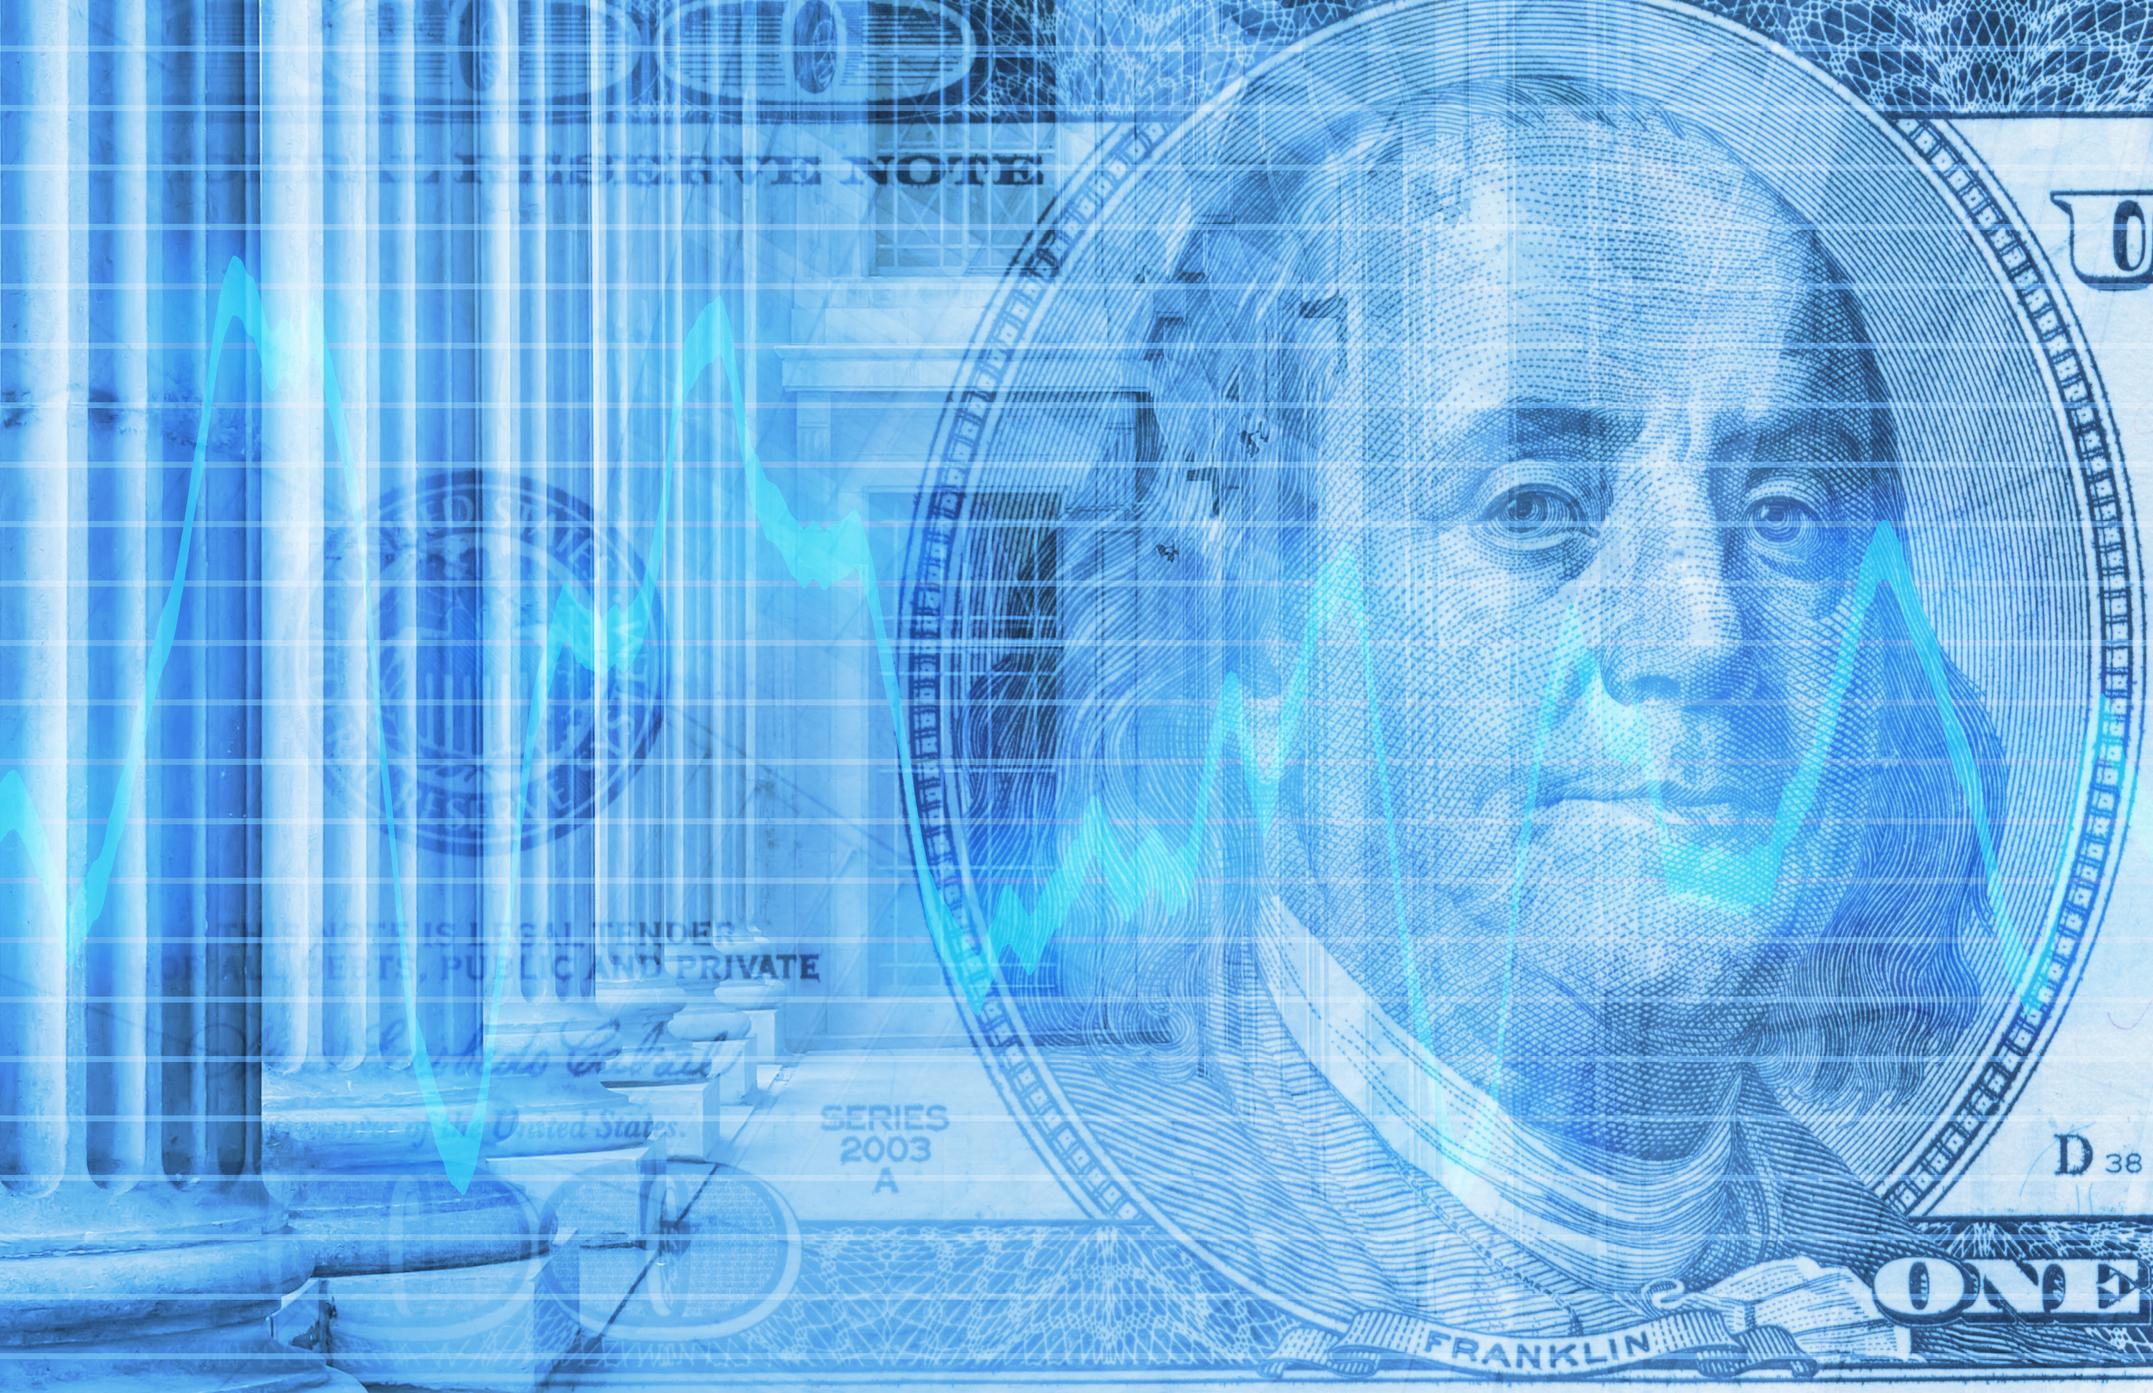 One-hundred dollar bill and stock market chart